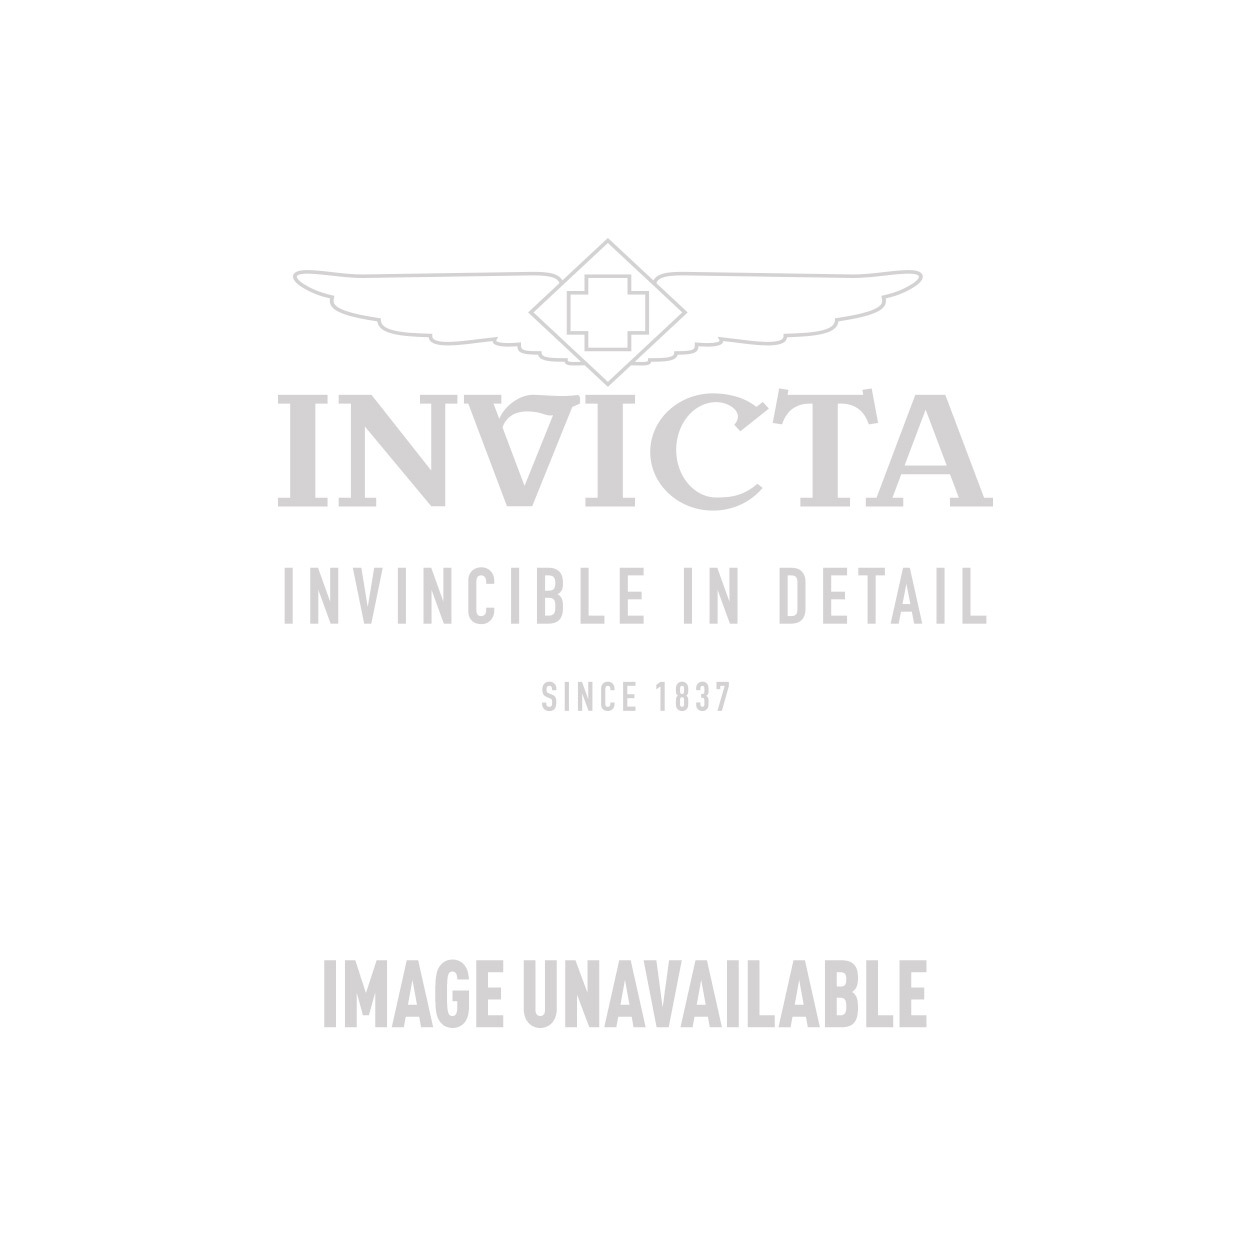 Invicta Speedway Quartz Watch - Stainless Steel case Stainless Steel band - Model 19283